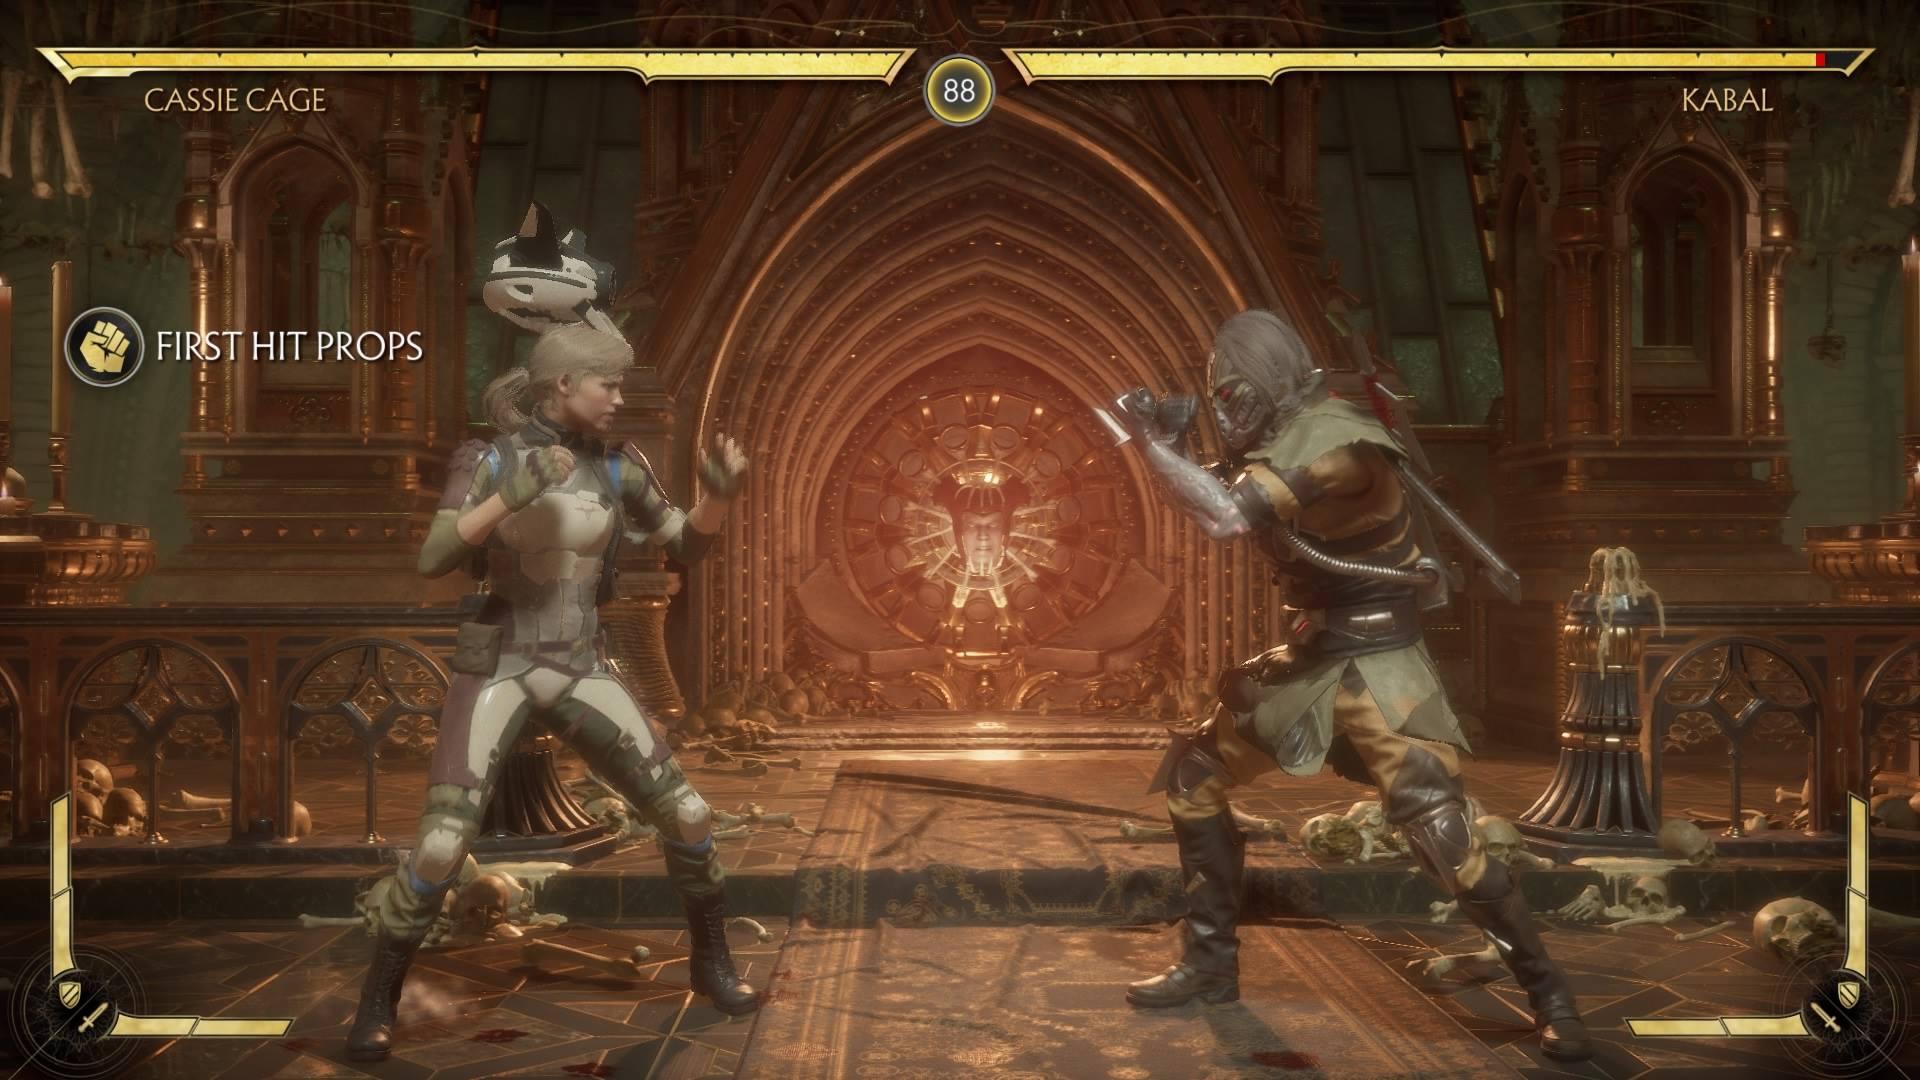 3rd-strike com | Mortal Kombat 11 – Review